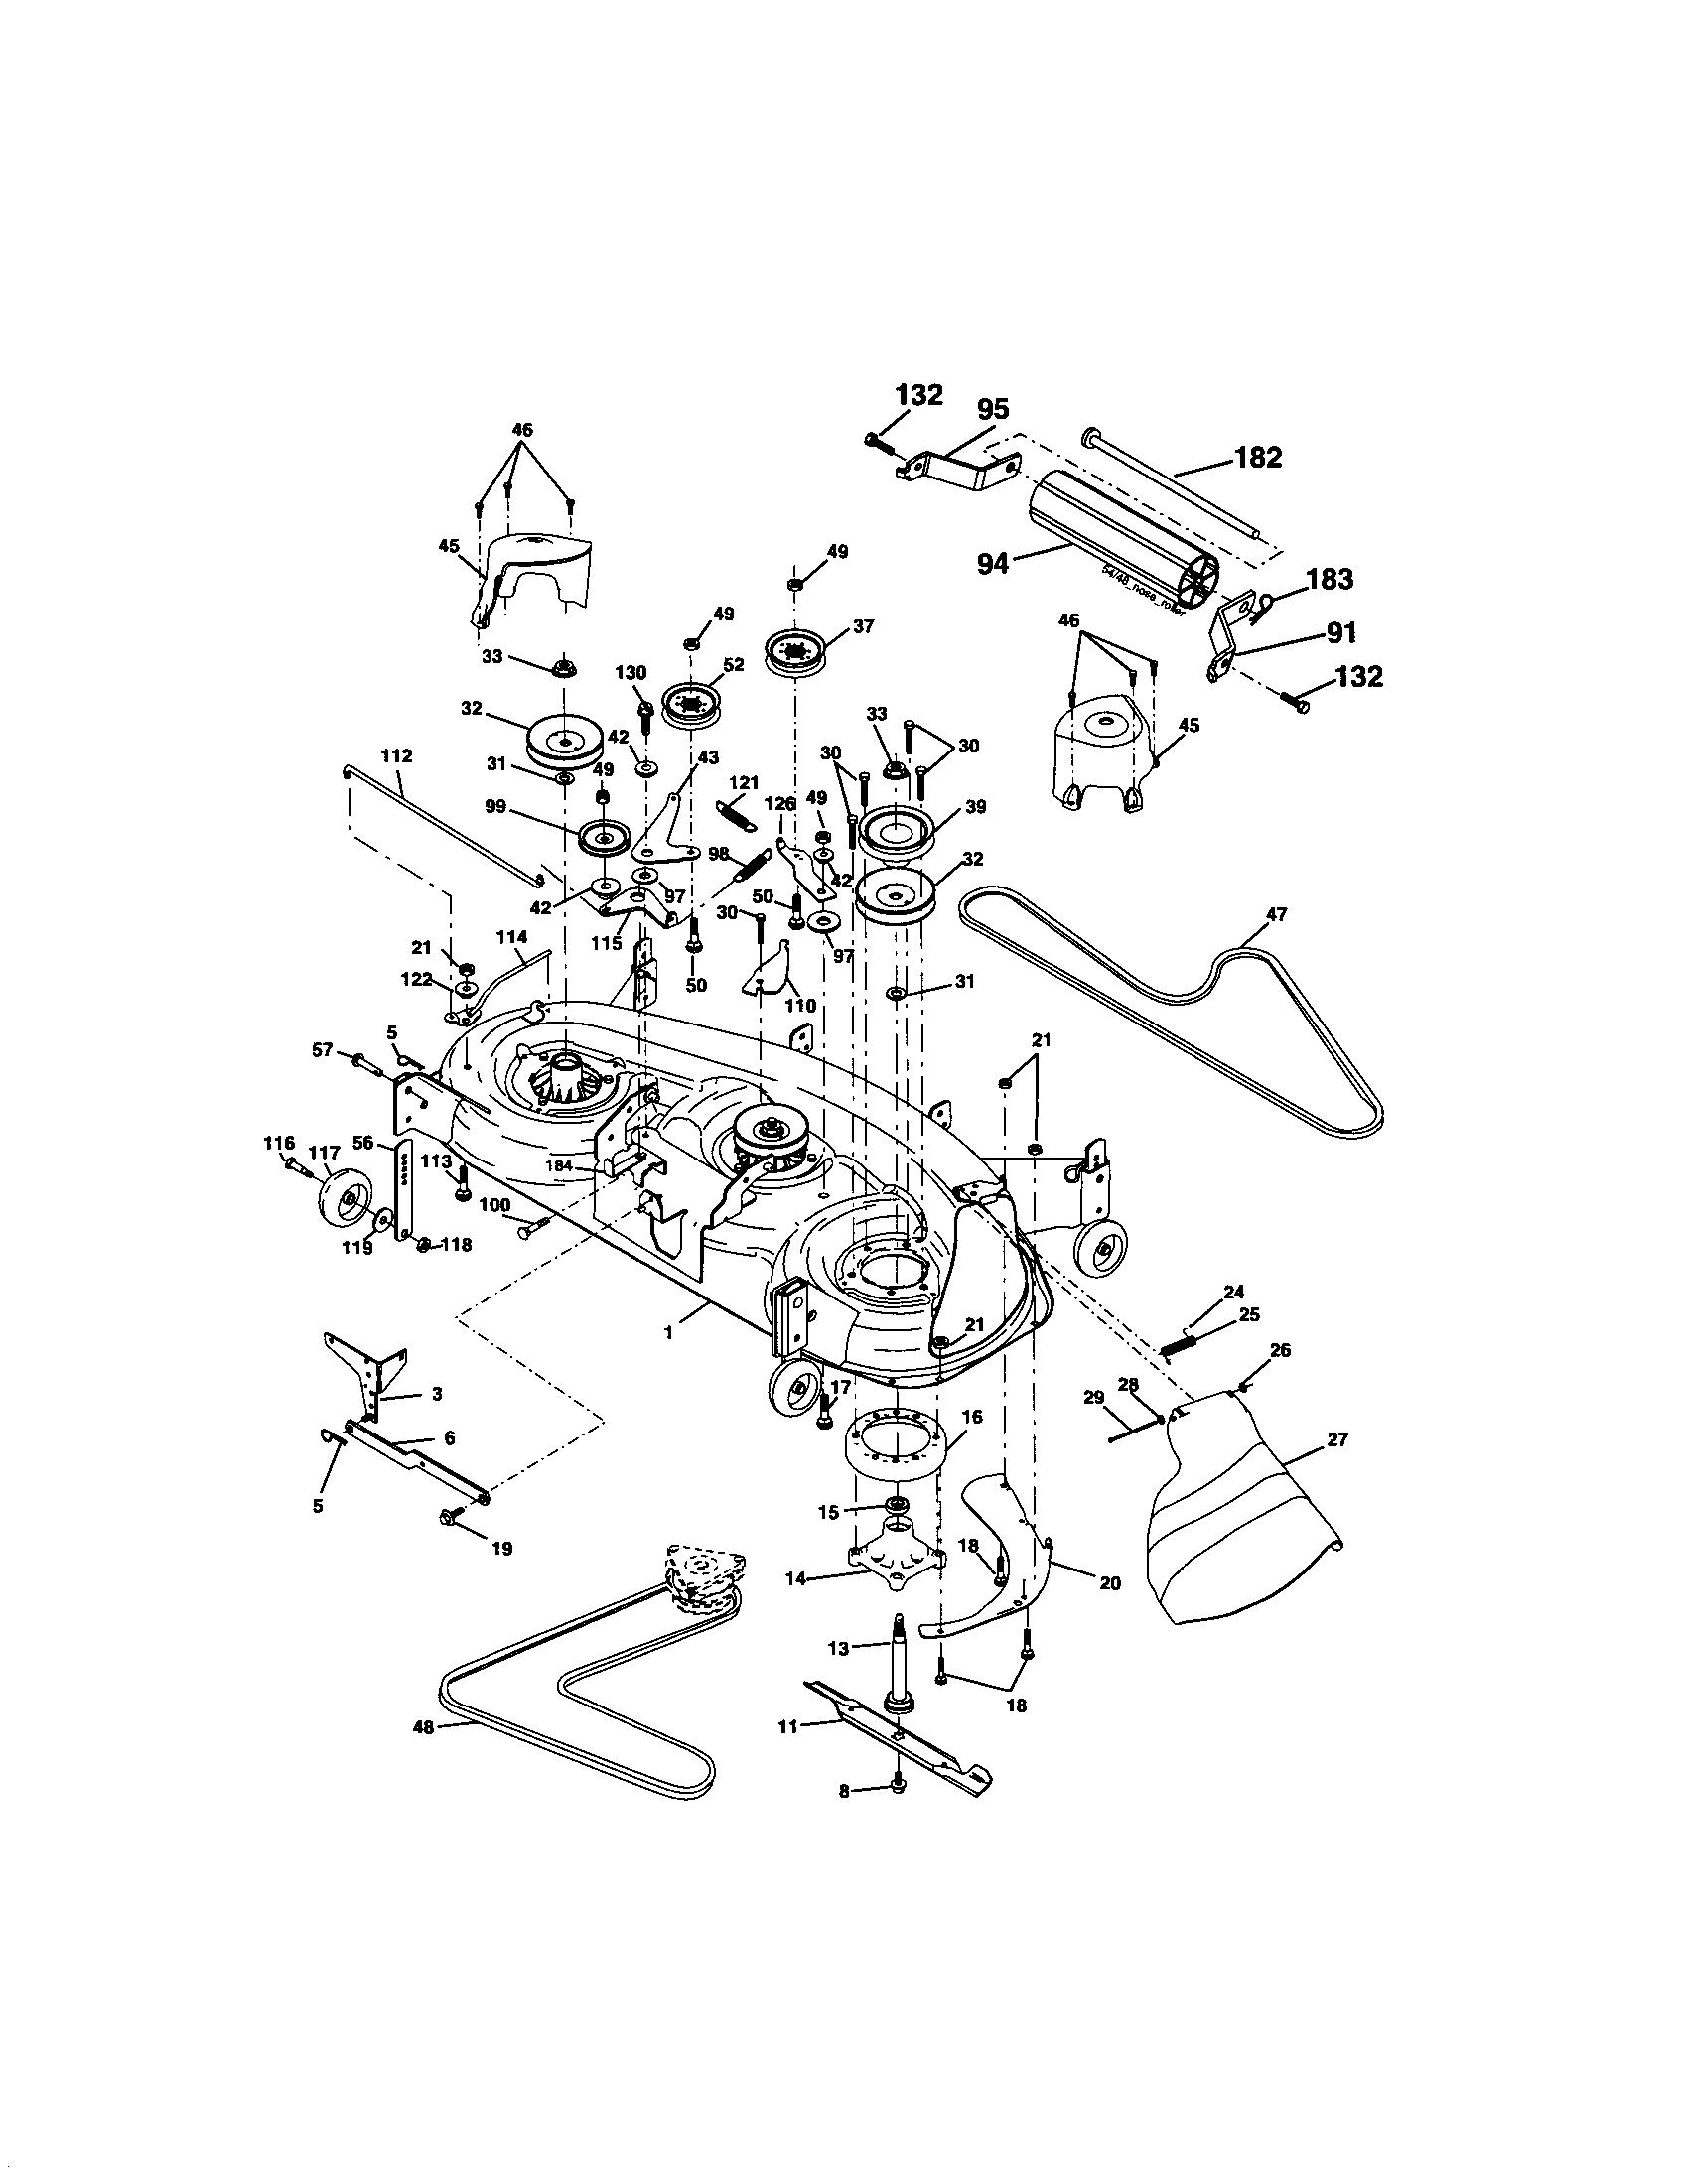 craftsman gt5000 deck wiring diagrams